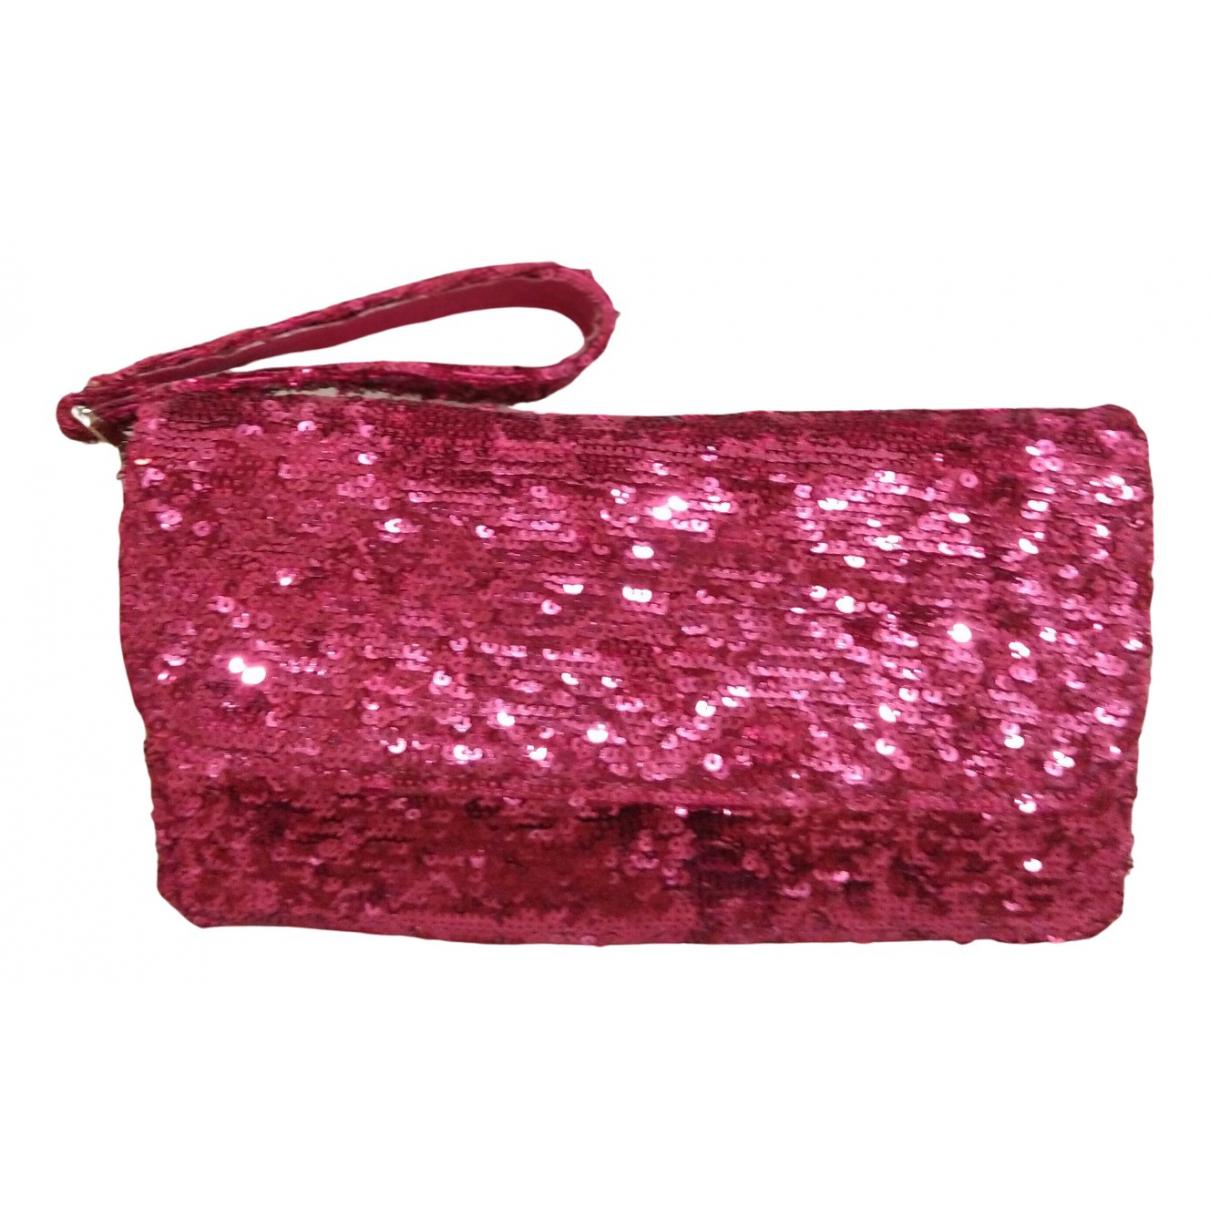 Ghibli \N Pink Leather Clutch bag for Women \N